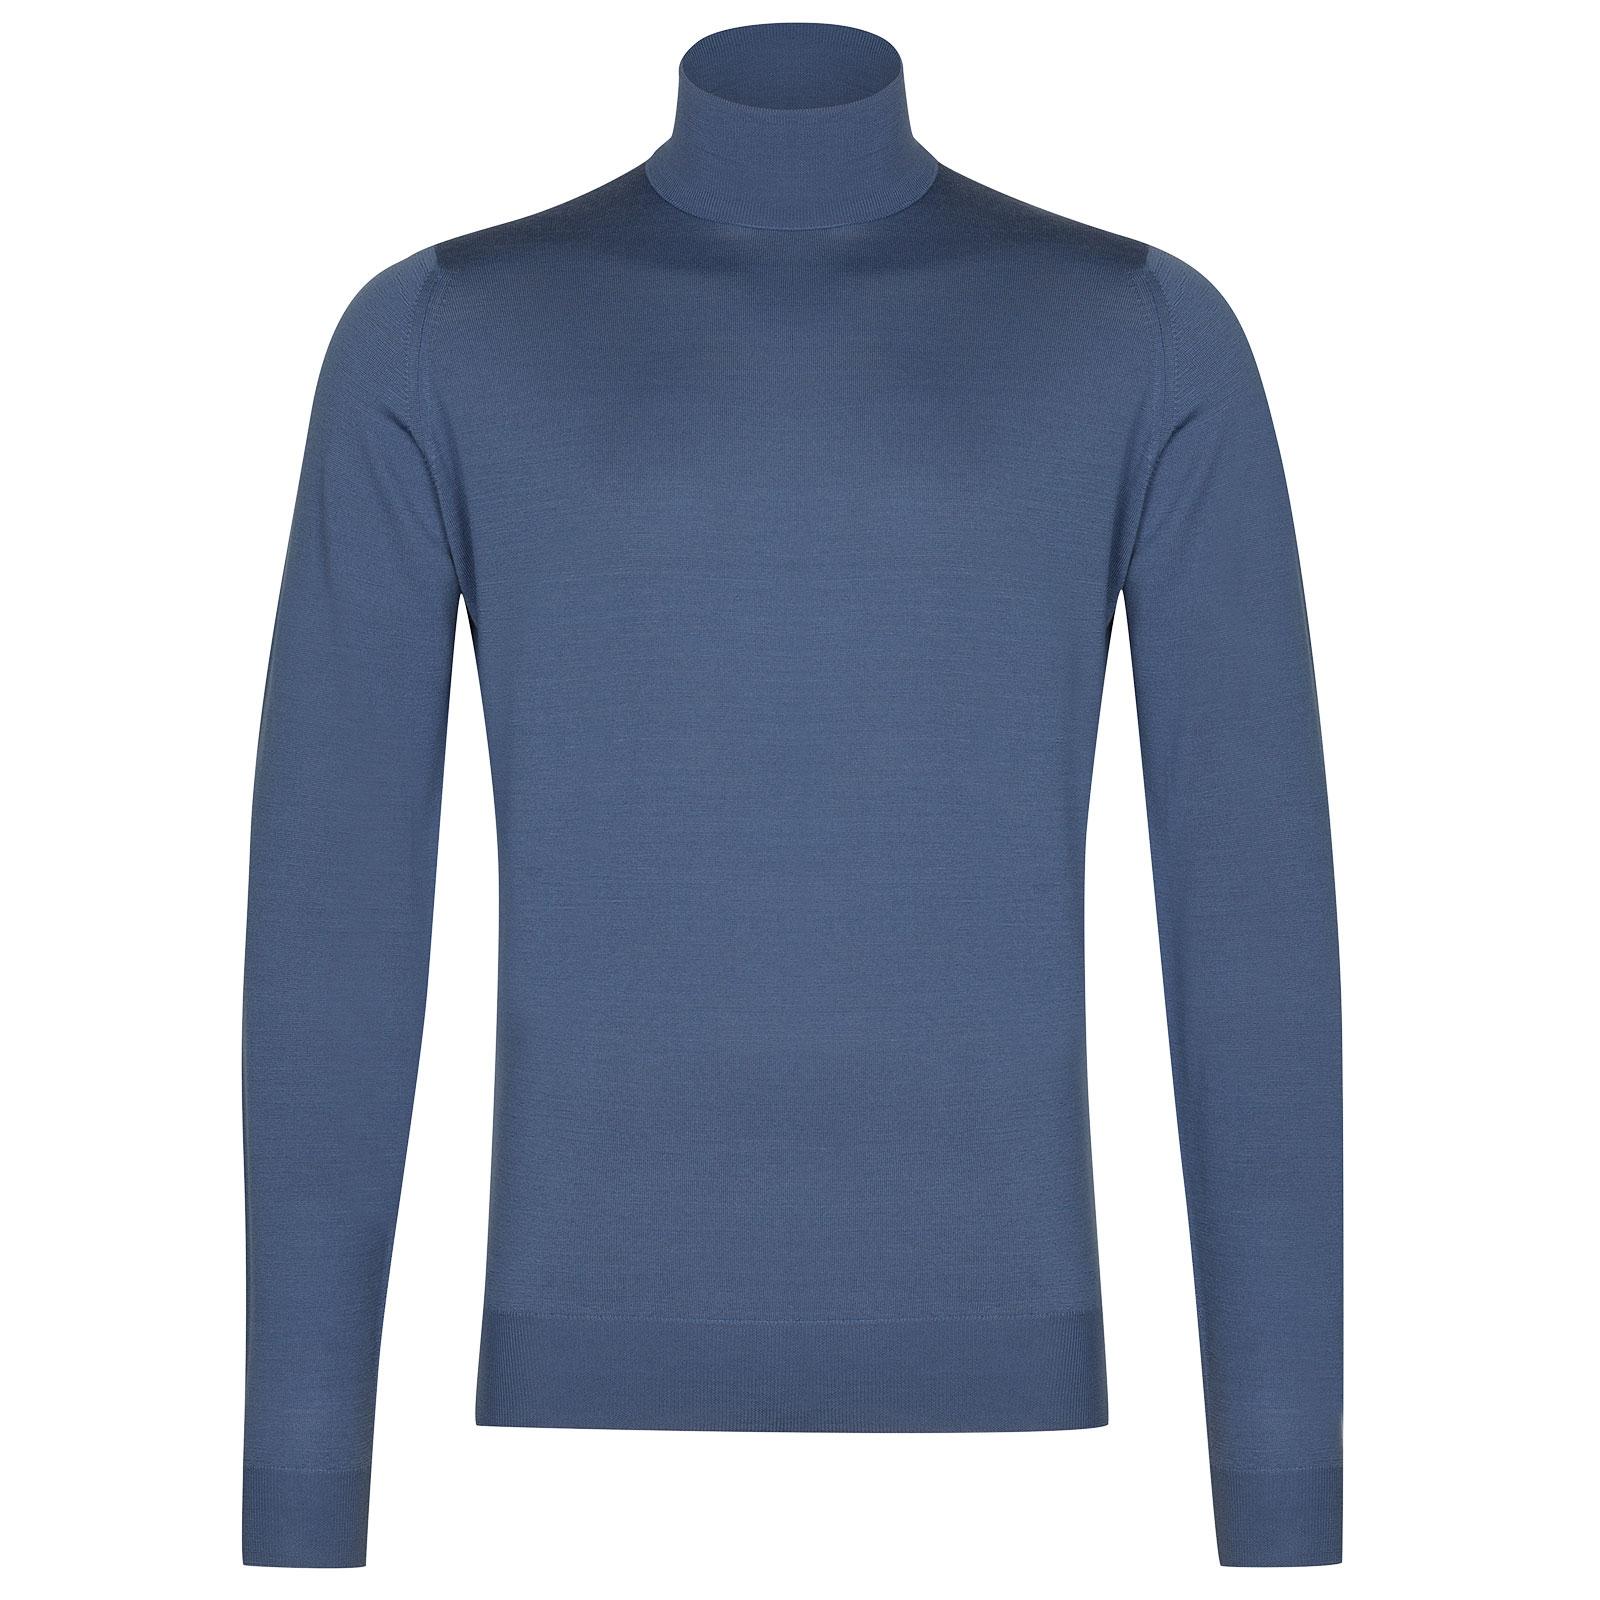 John Smedley Cherwell in Blue Iris Pullover-LGE